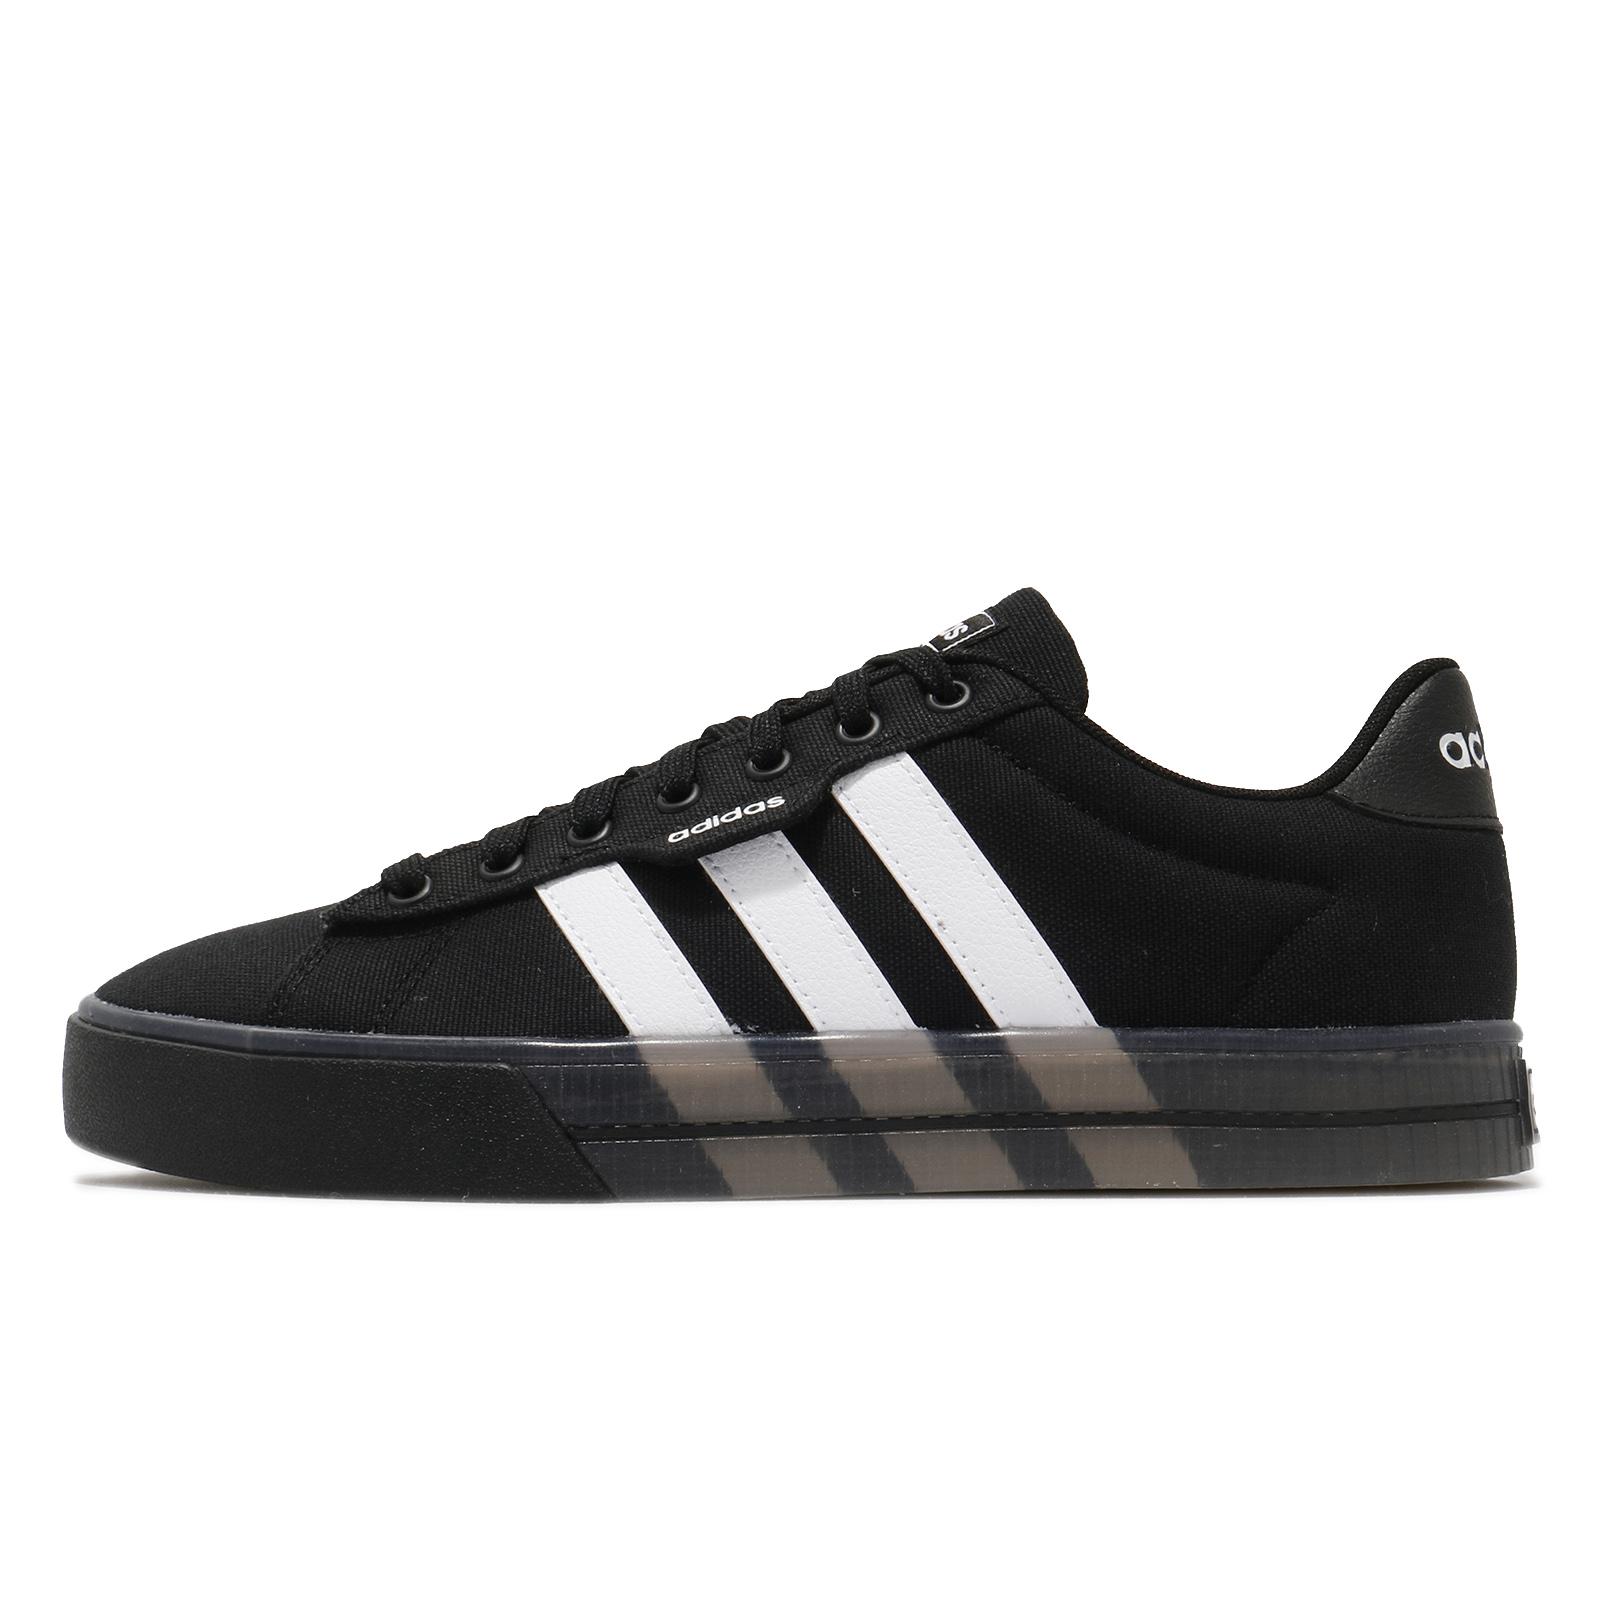 adidas 休閒鞋 Daily 3.0 黑白 三條線 基本款 男鞋 滑板鞋 愛迪達 Neo 【ACS】 FW7050